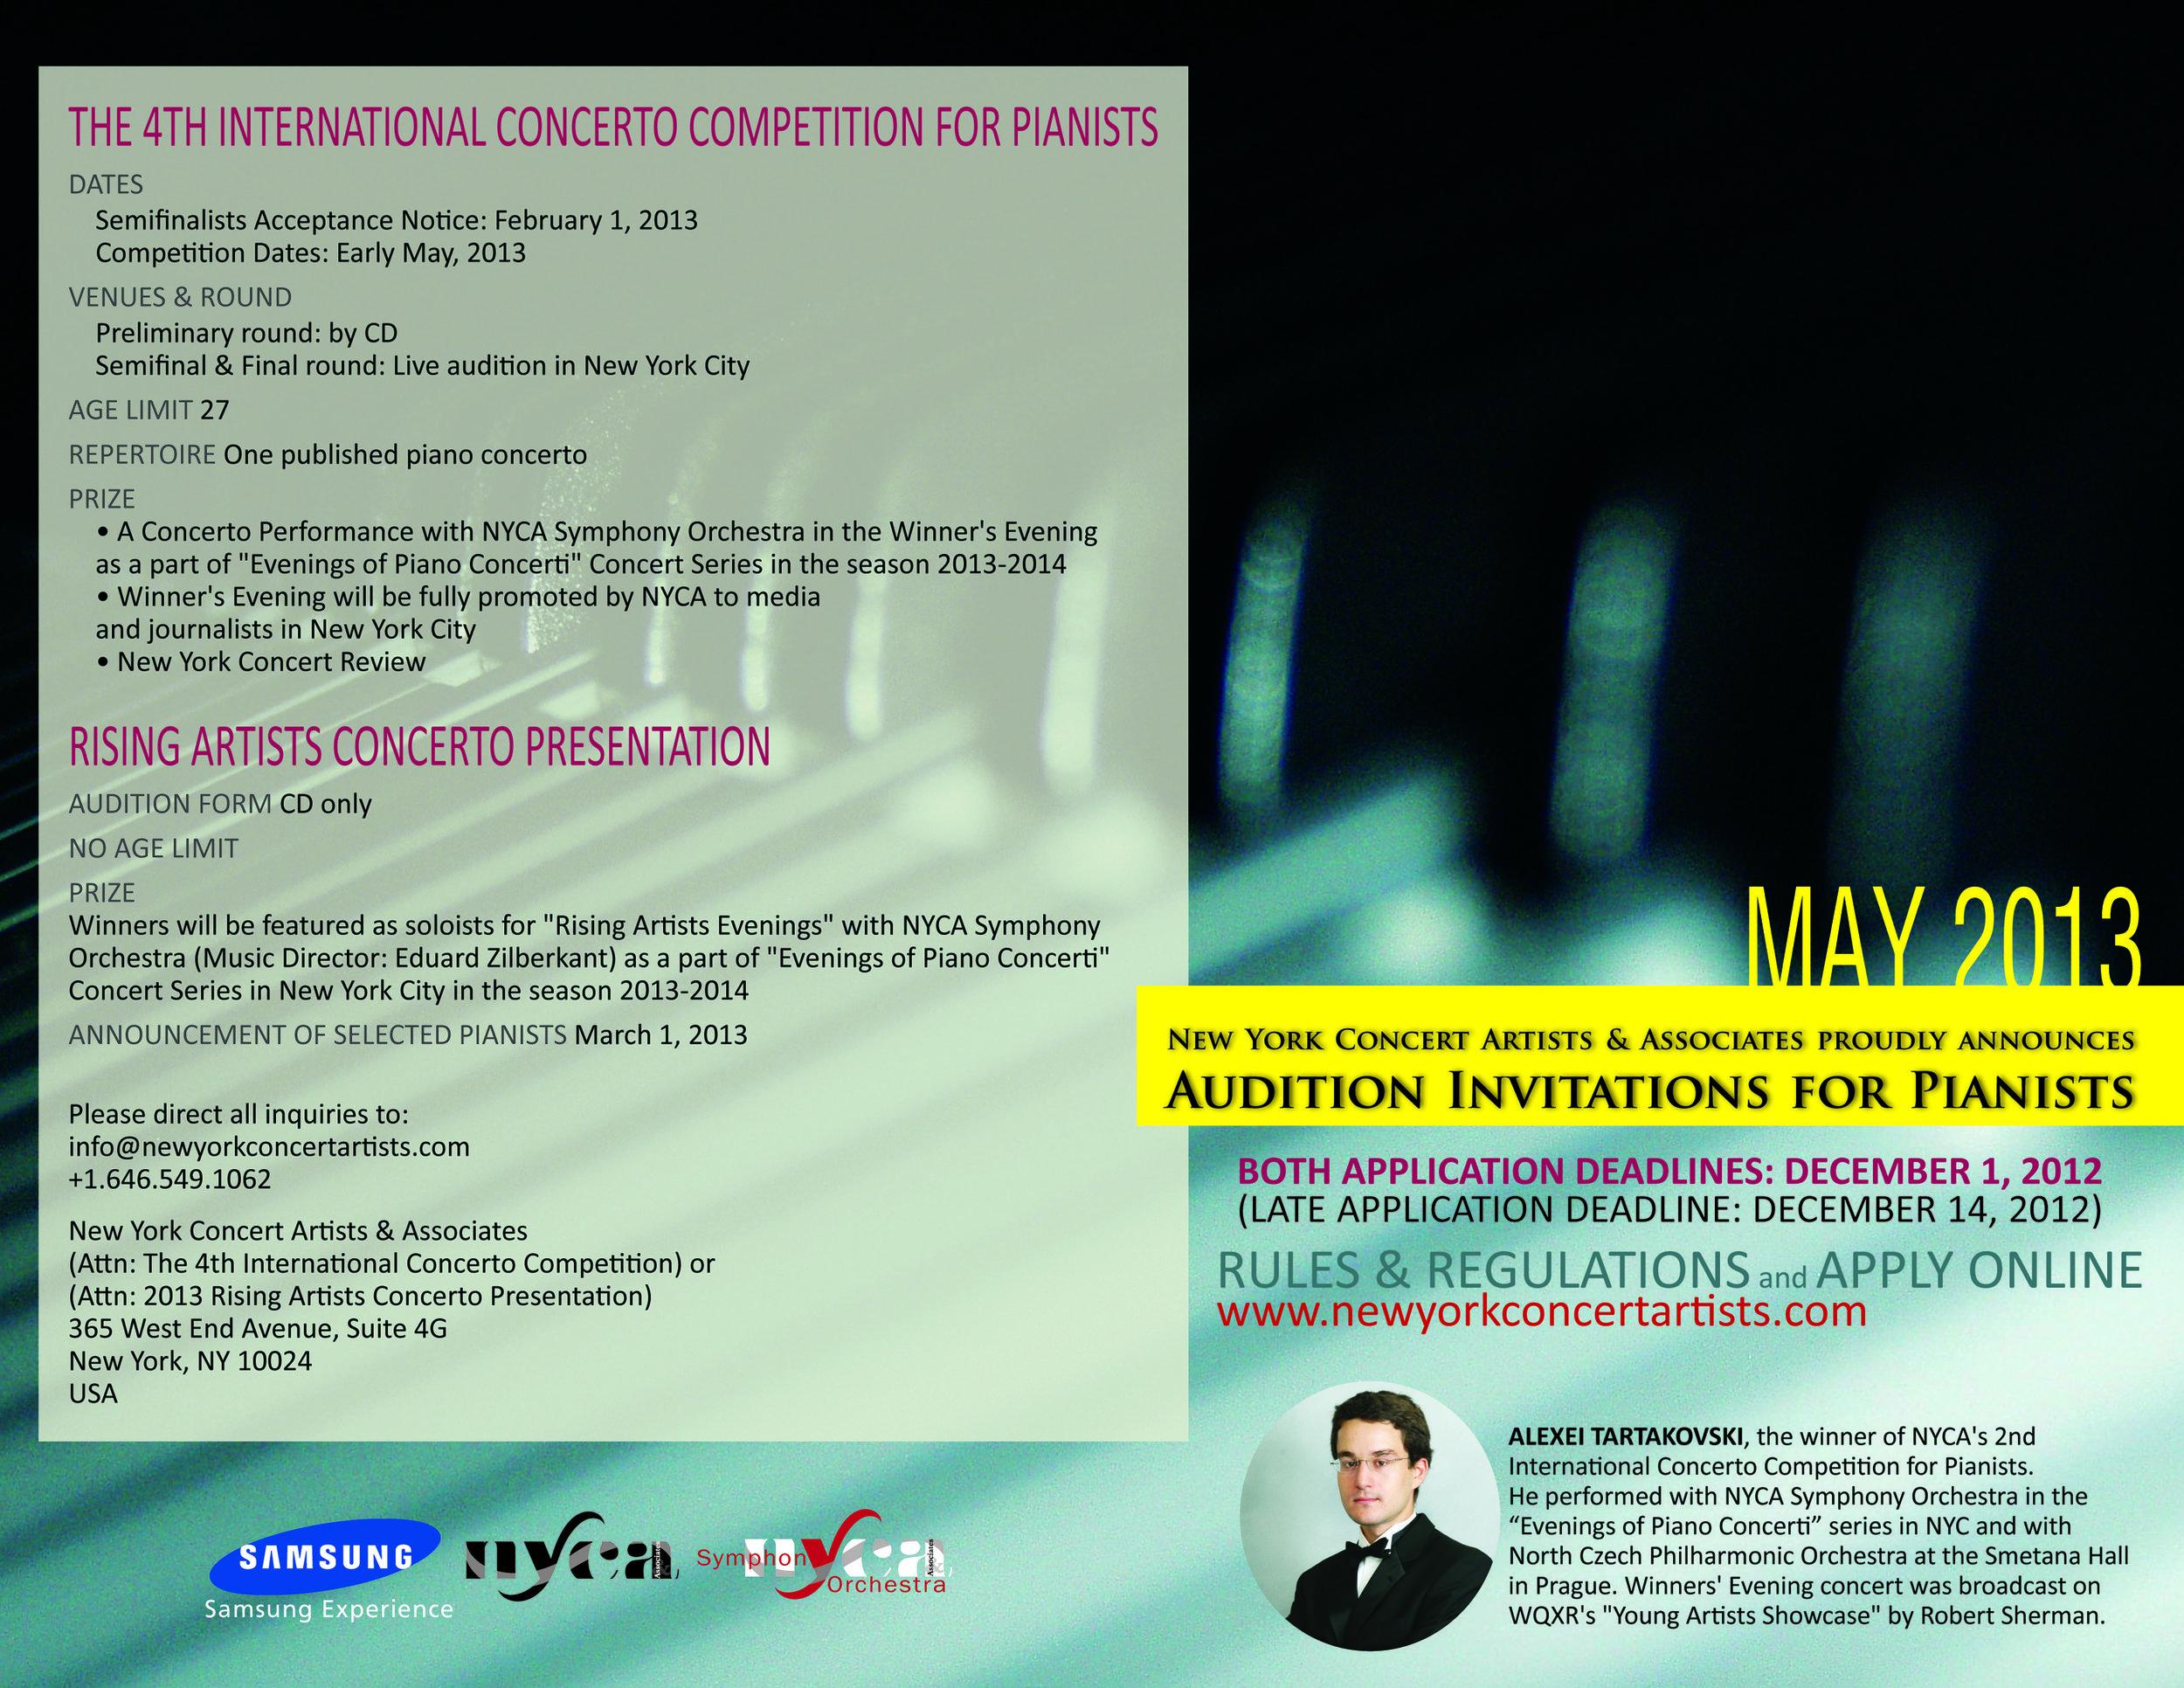 NYCA_Auditionflyer_8.5x11_h_2013_EN_final.jpg